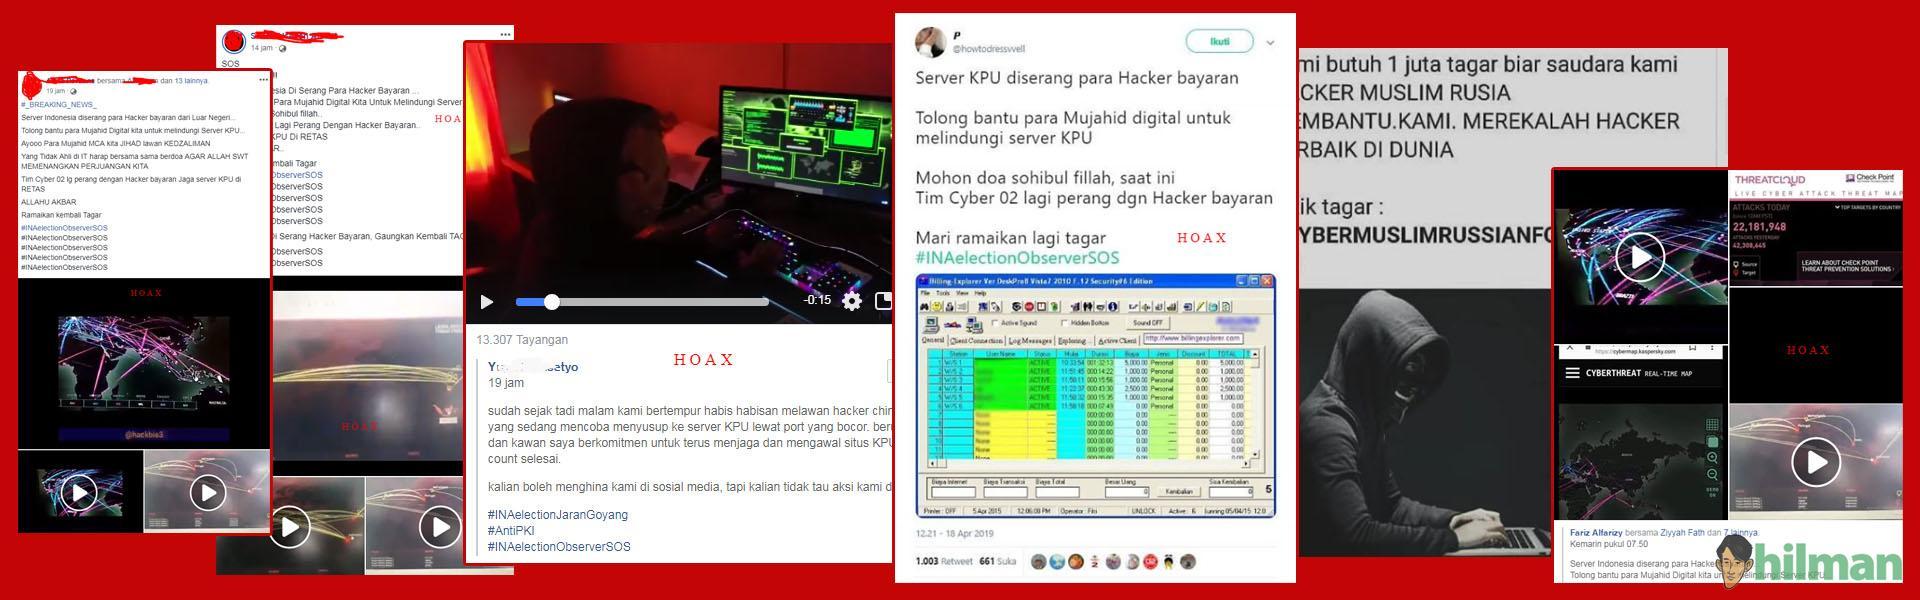 Hoax Perang Cyber Server KPU dan...